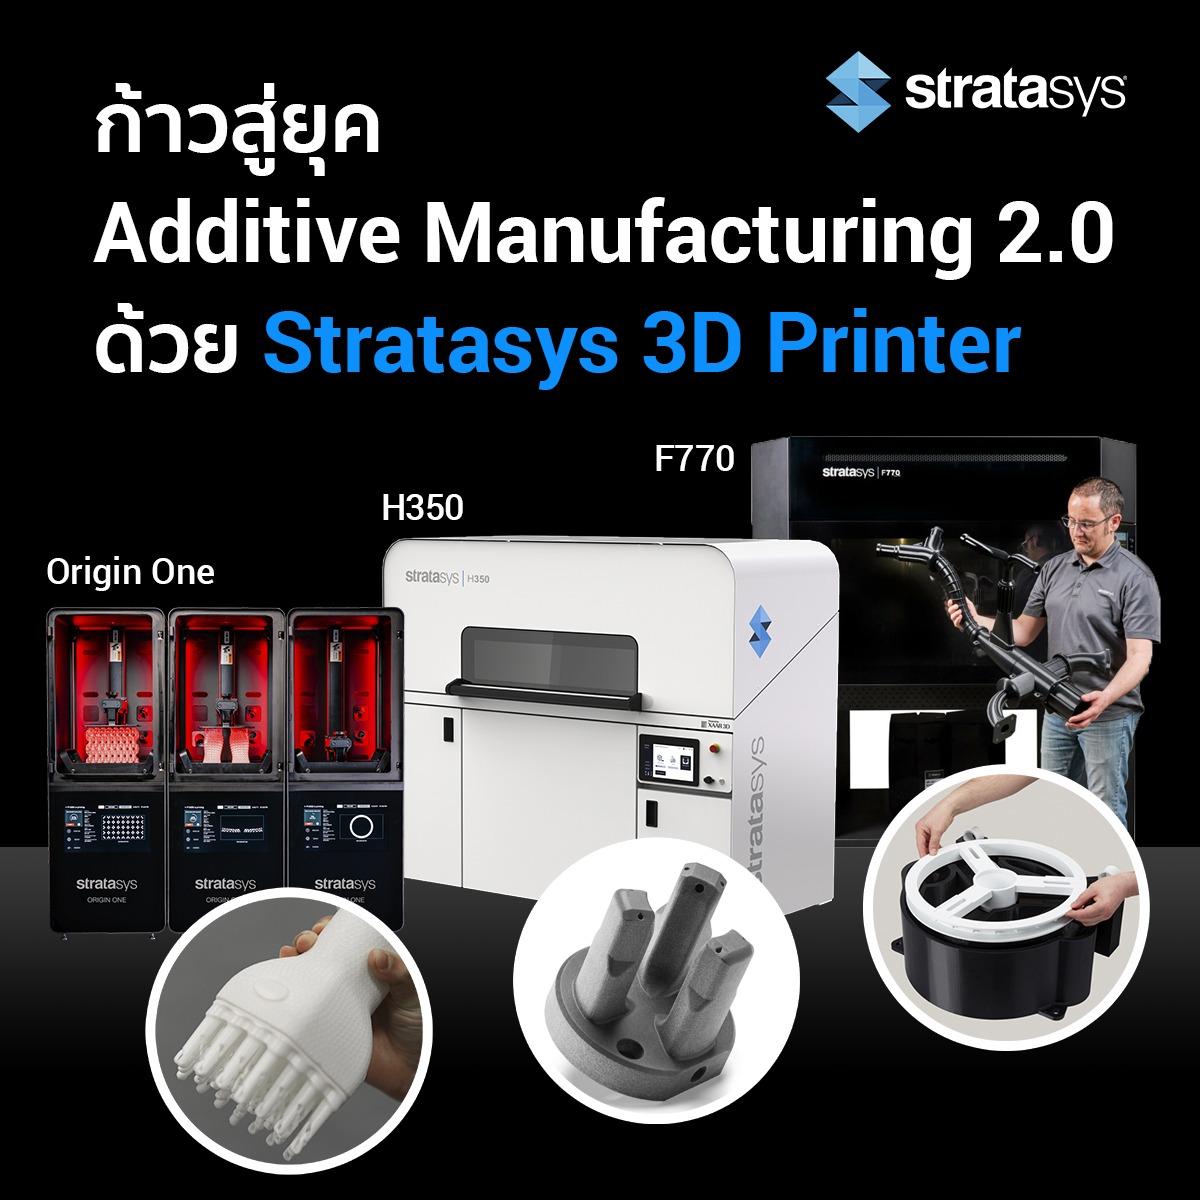 3D Printers ที่ดีที่สุด จาก Stratasys ก้าวสู่ยุค Additive Munutacturing 2.0